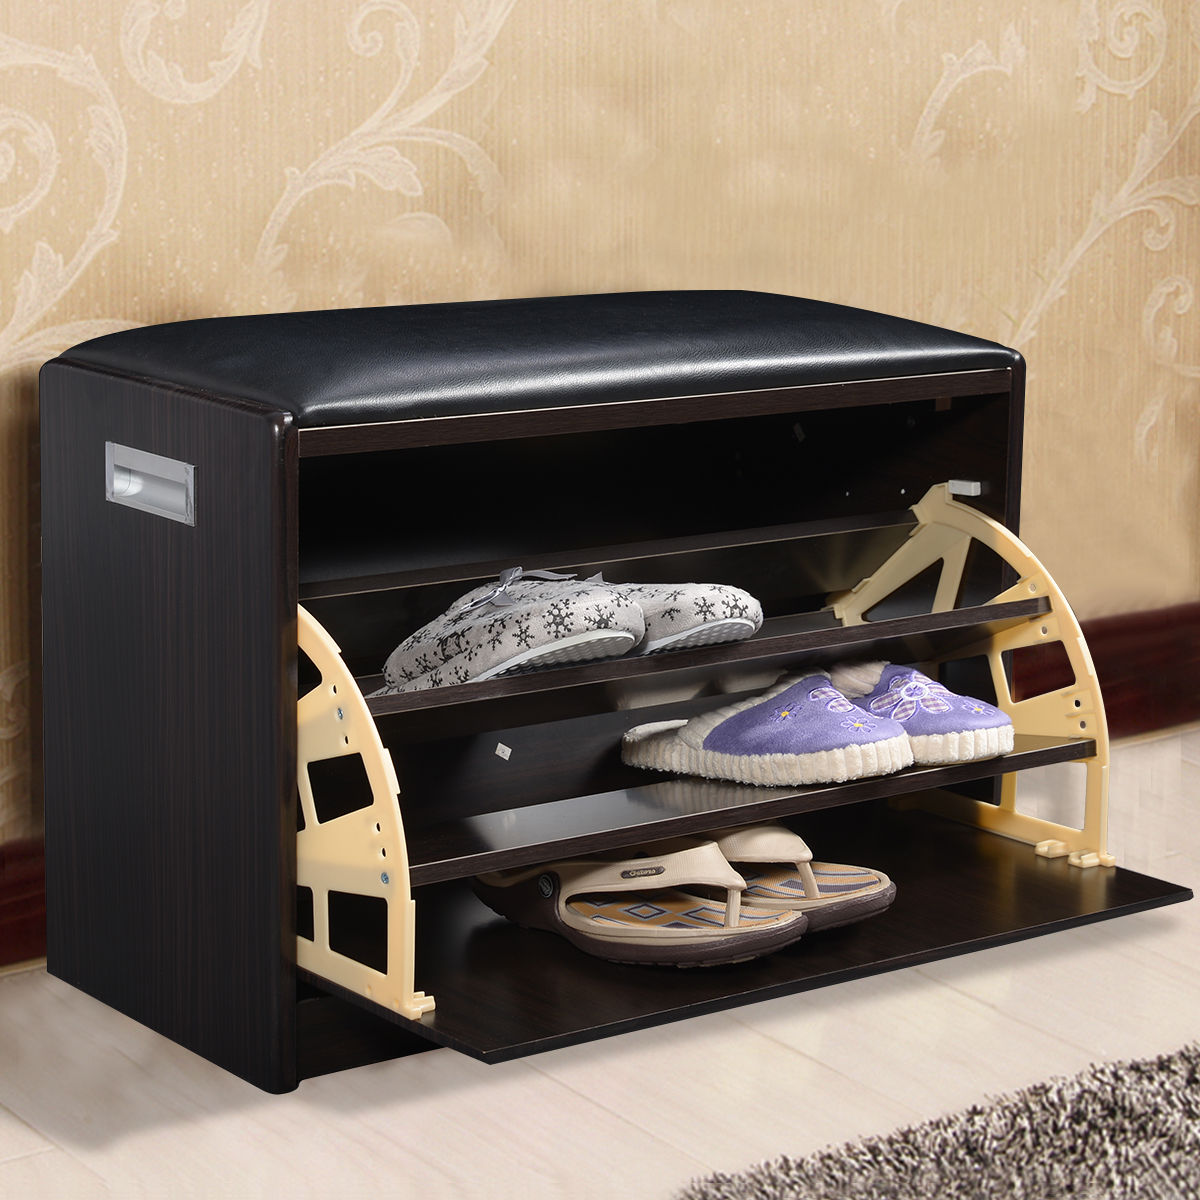 Giantex Wood Shoe Storage Ottoman Bench Modern Shoes Cabinet Closet Shelf Entryway Multipurpose Pouffe Stool HW49316BK francis black fabric ottoman bench